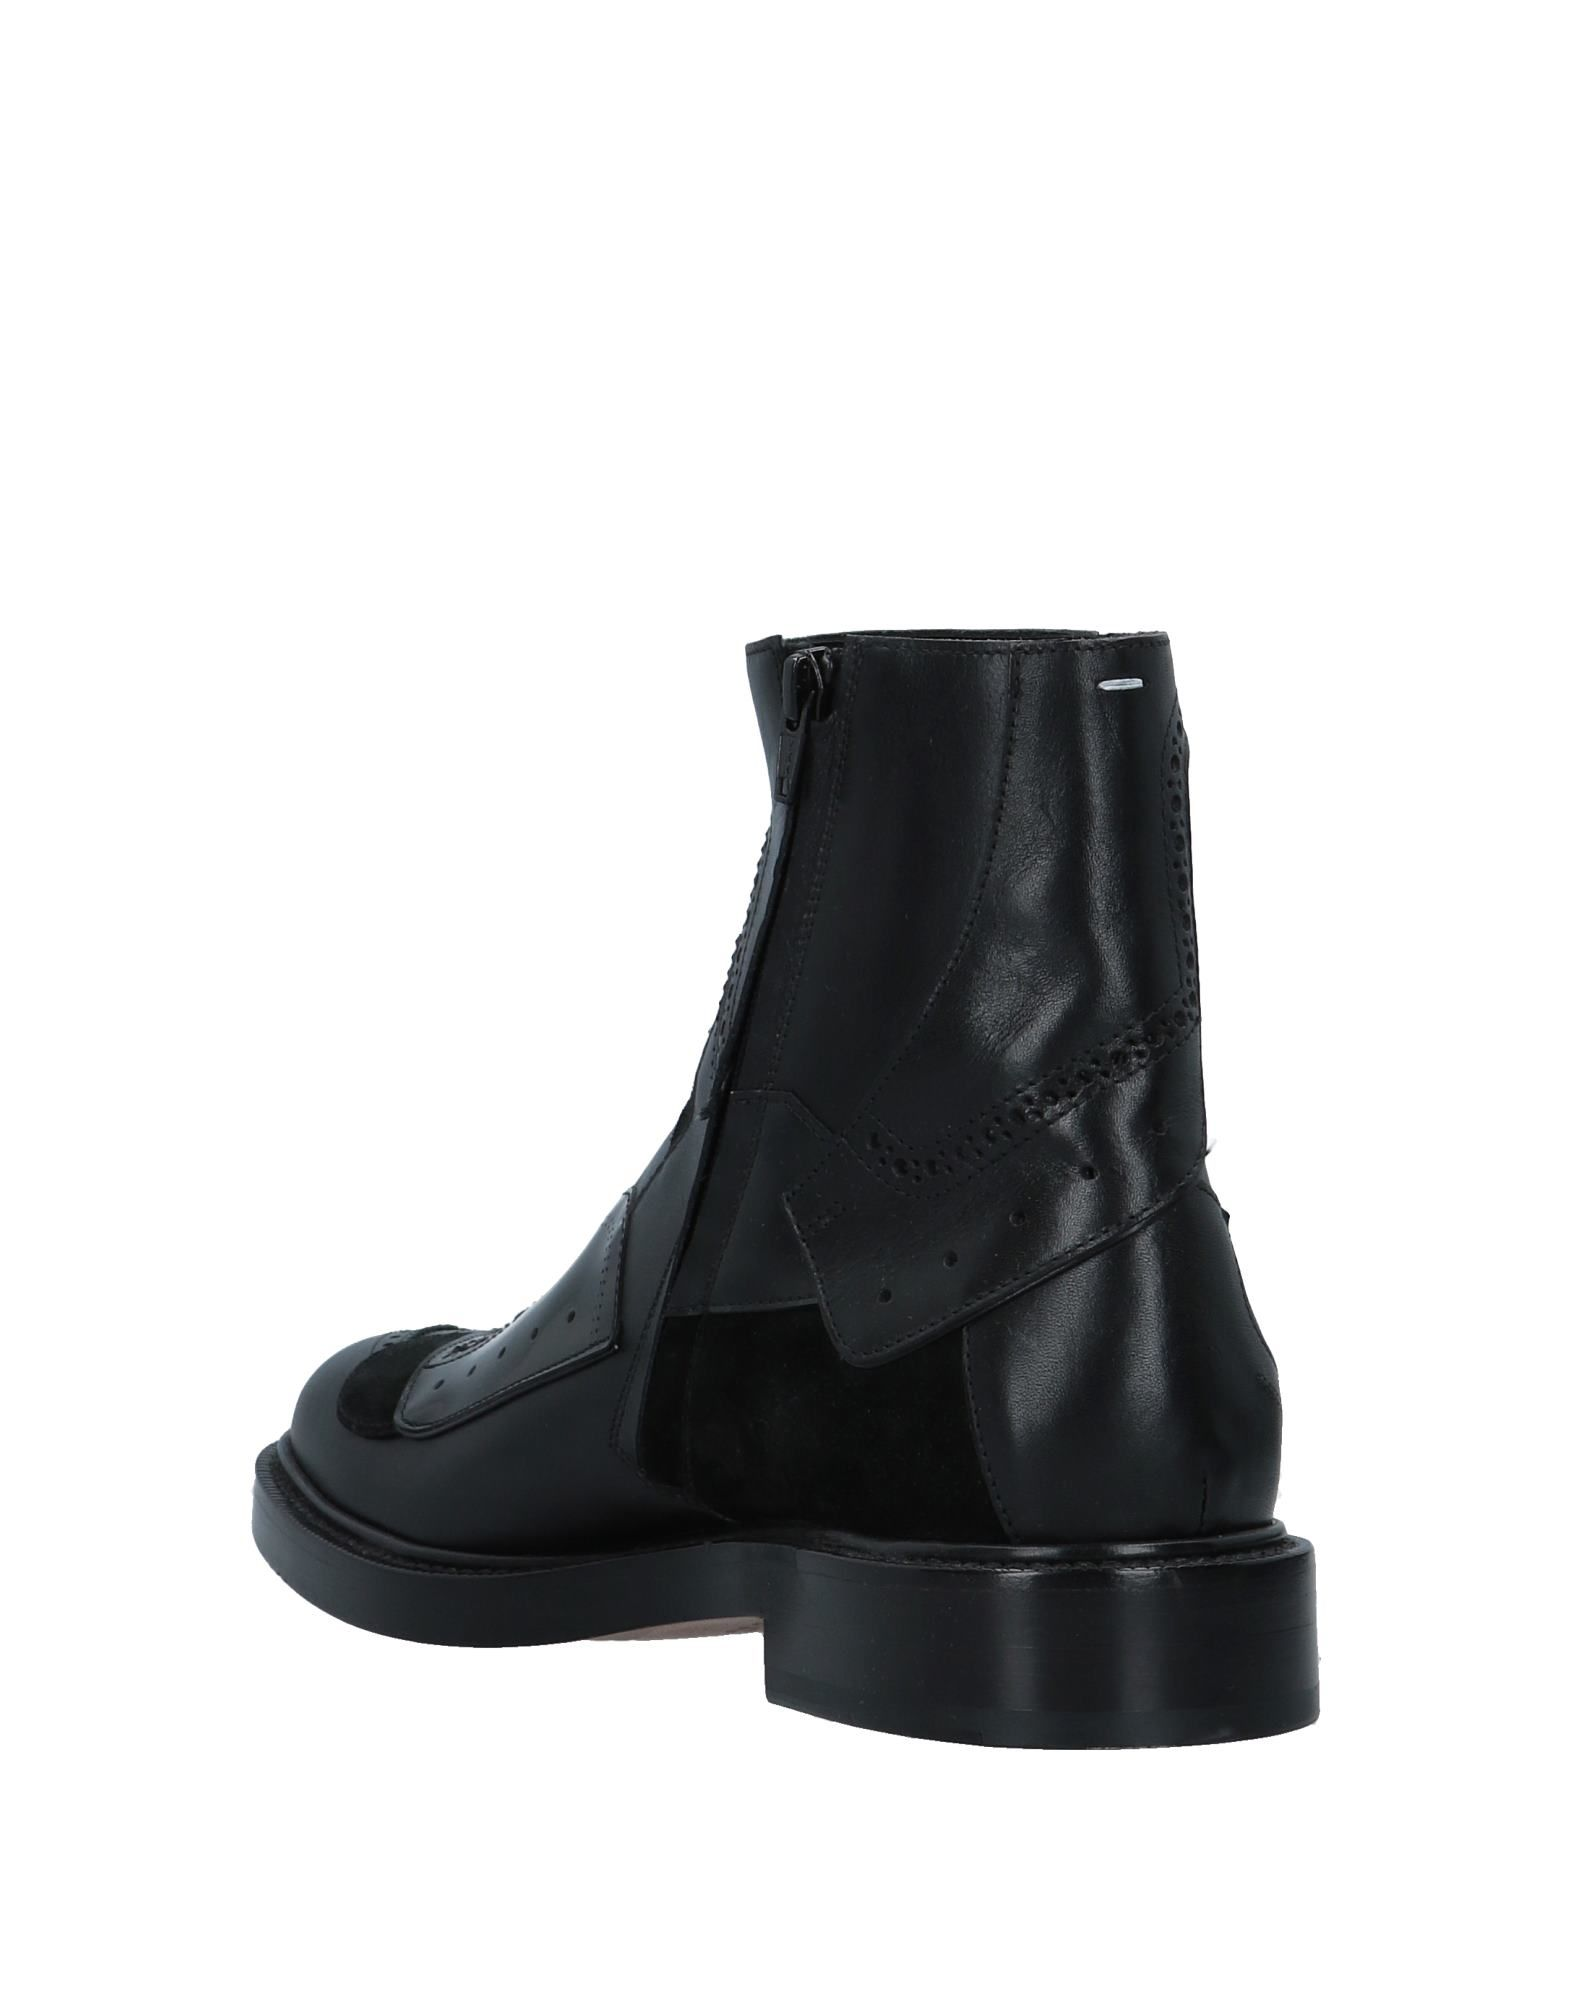 Maison Margiela Stiefelette Herren  11535532UD 11535532UD 11535532UD Gute Qualität beliebte Schuhe e1e08c